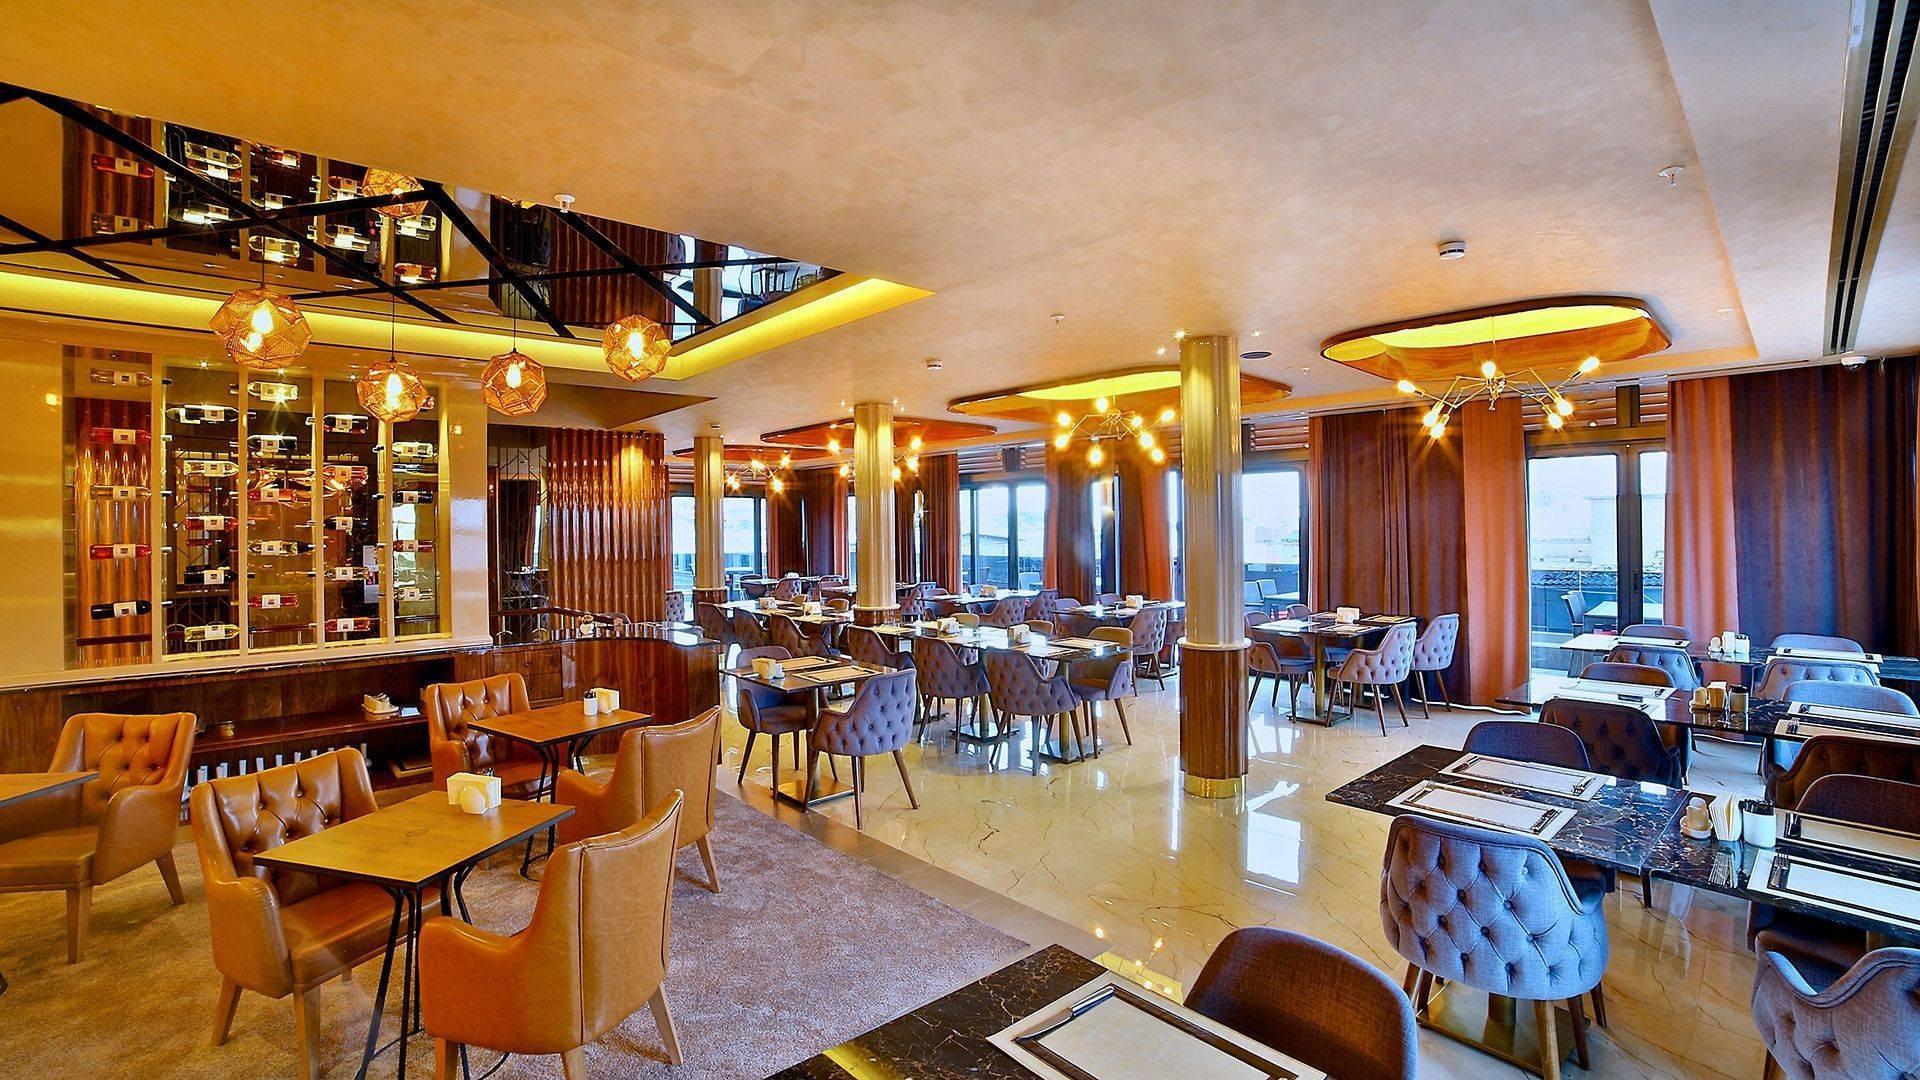 Beethoven Premium Otel, İstanbul, Laleli, 29664